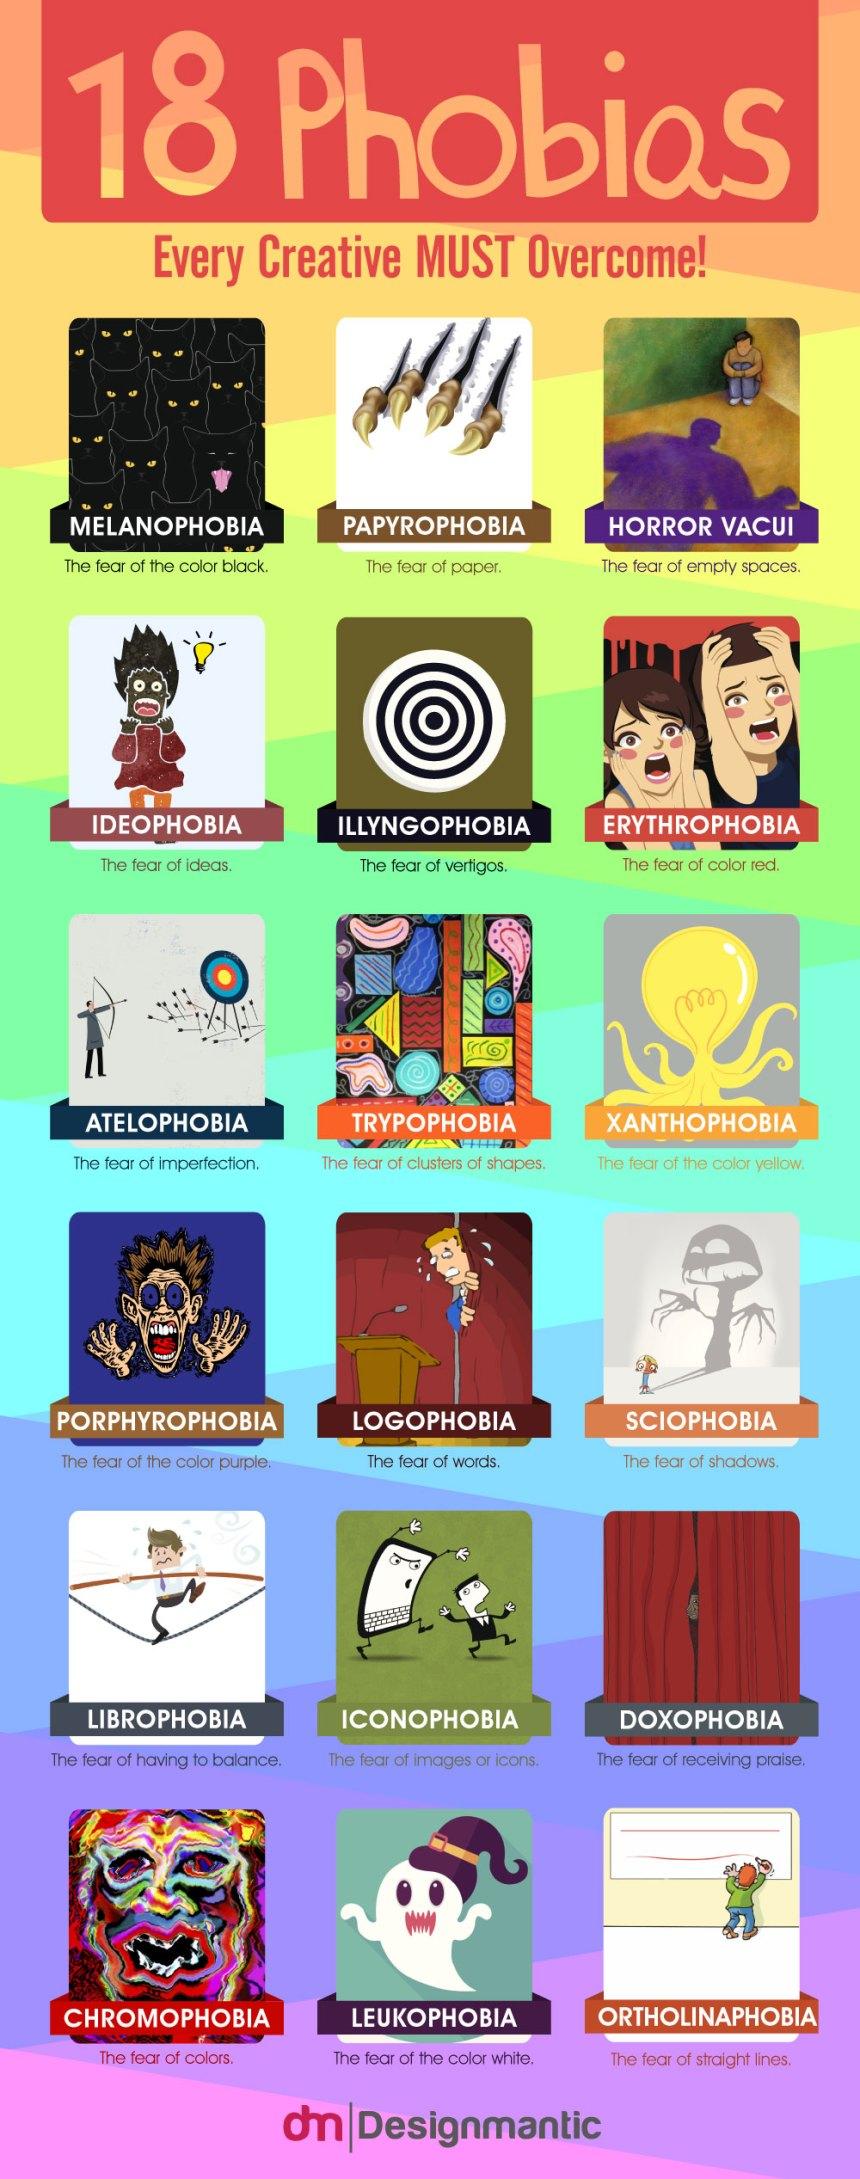 18 Phobias Every Creative MUST Overcome!